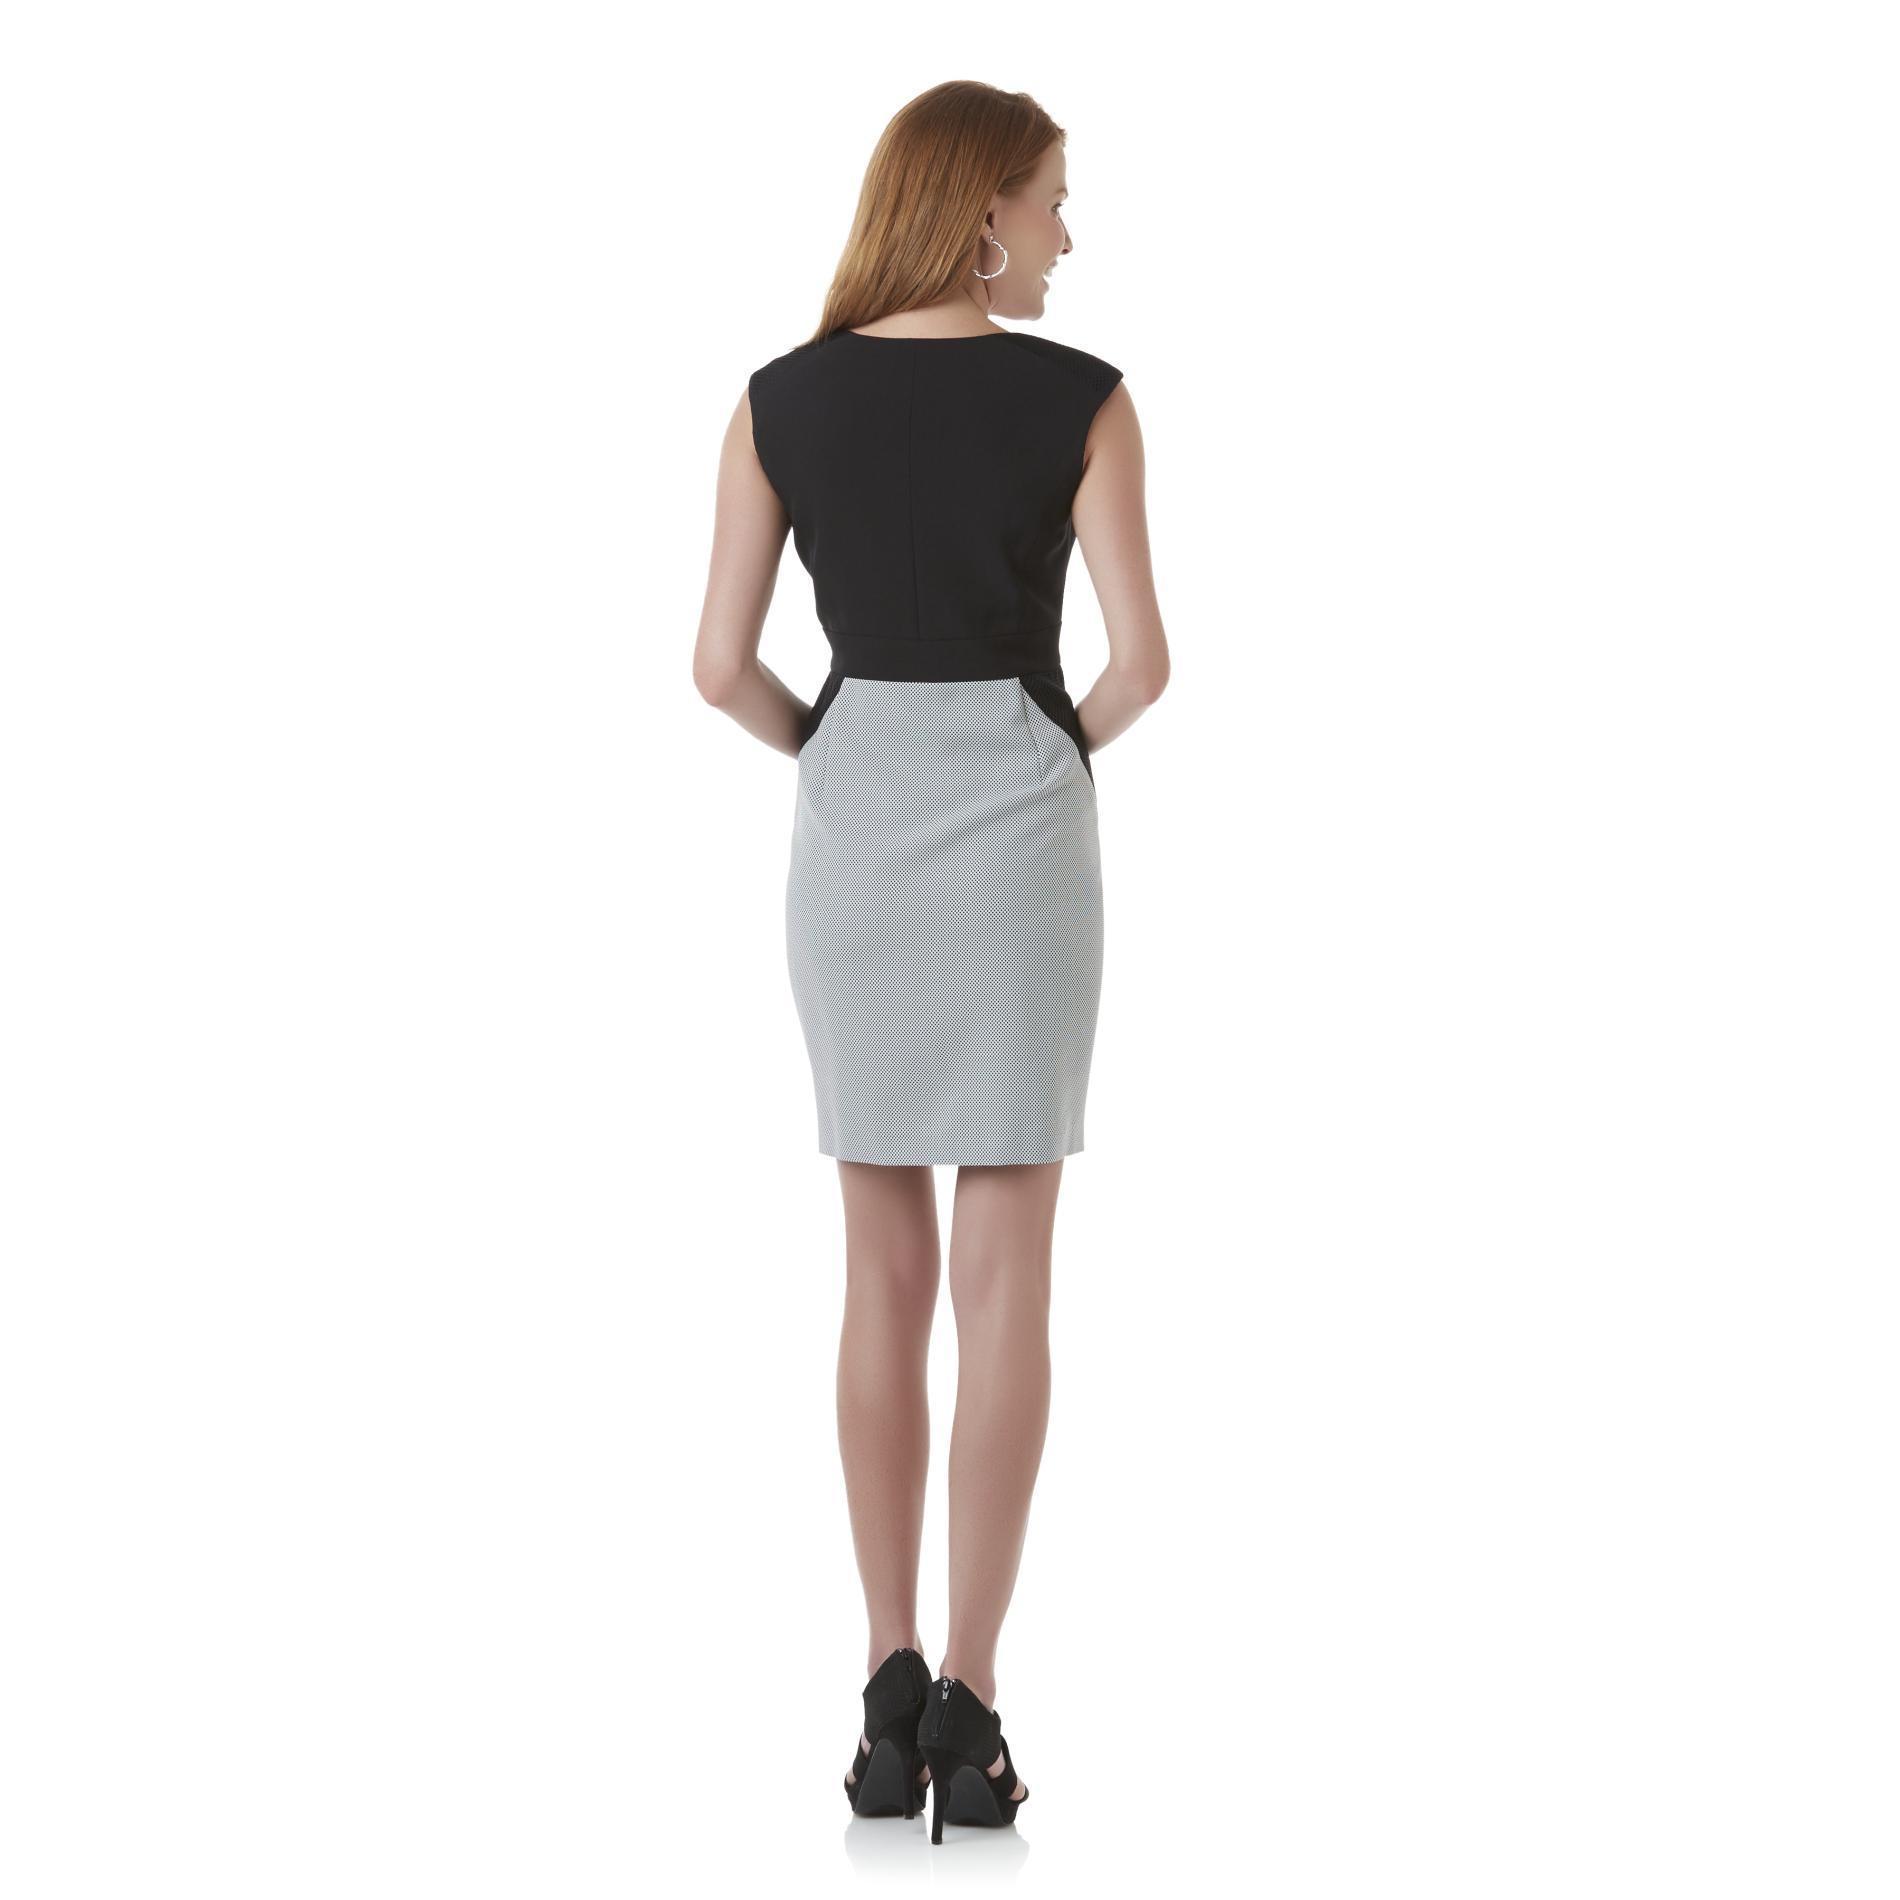 Covington Women's Sheath Dress - Polka Dot